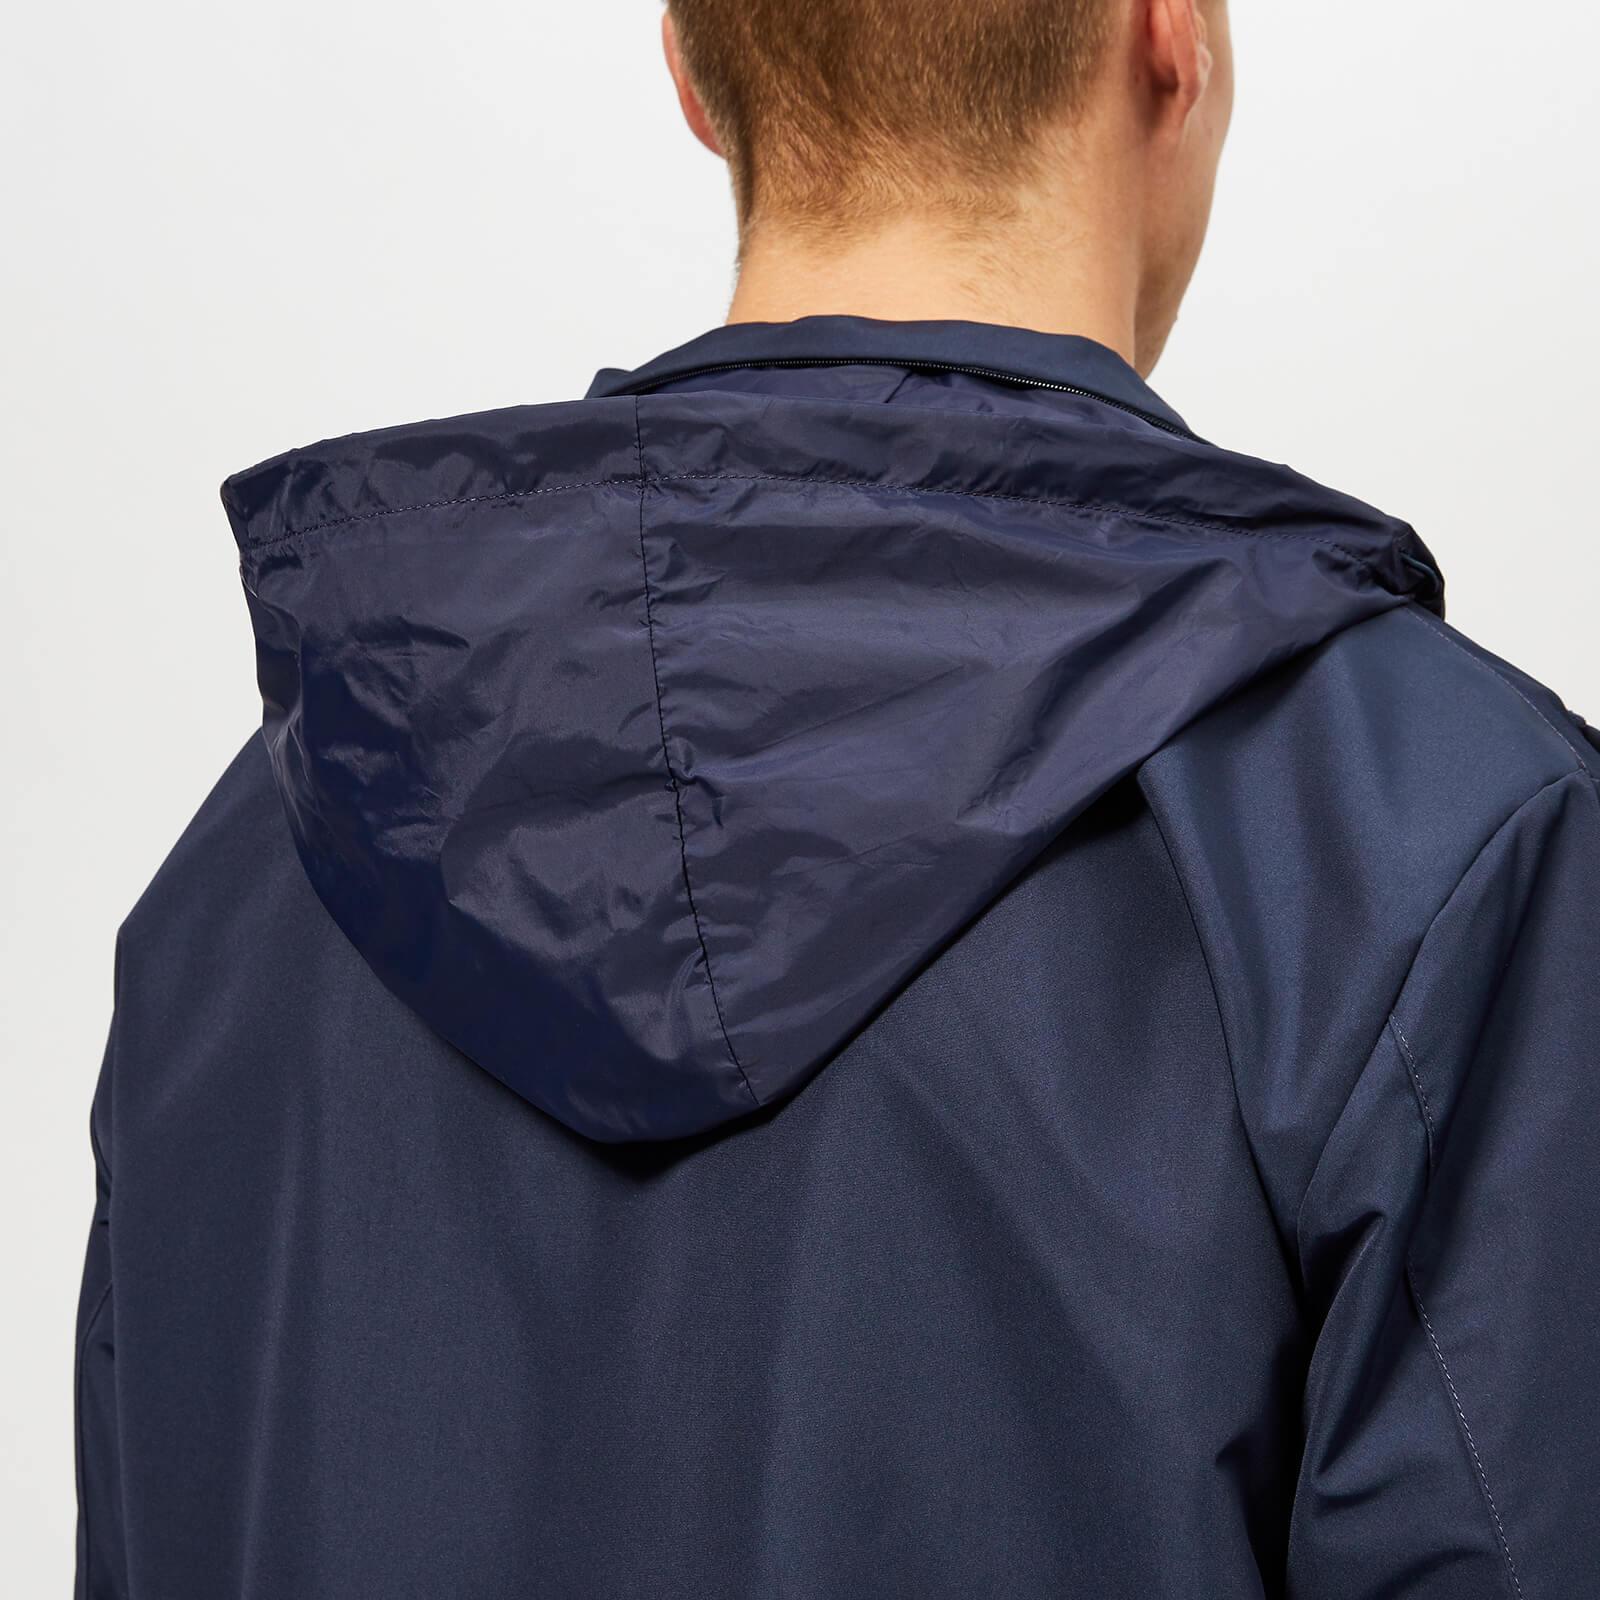 45a5944aca0 Lacoste - Blue Classic Blouson Jacket for Men - Lyst. View fullscreen